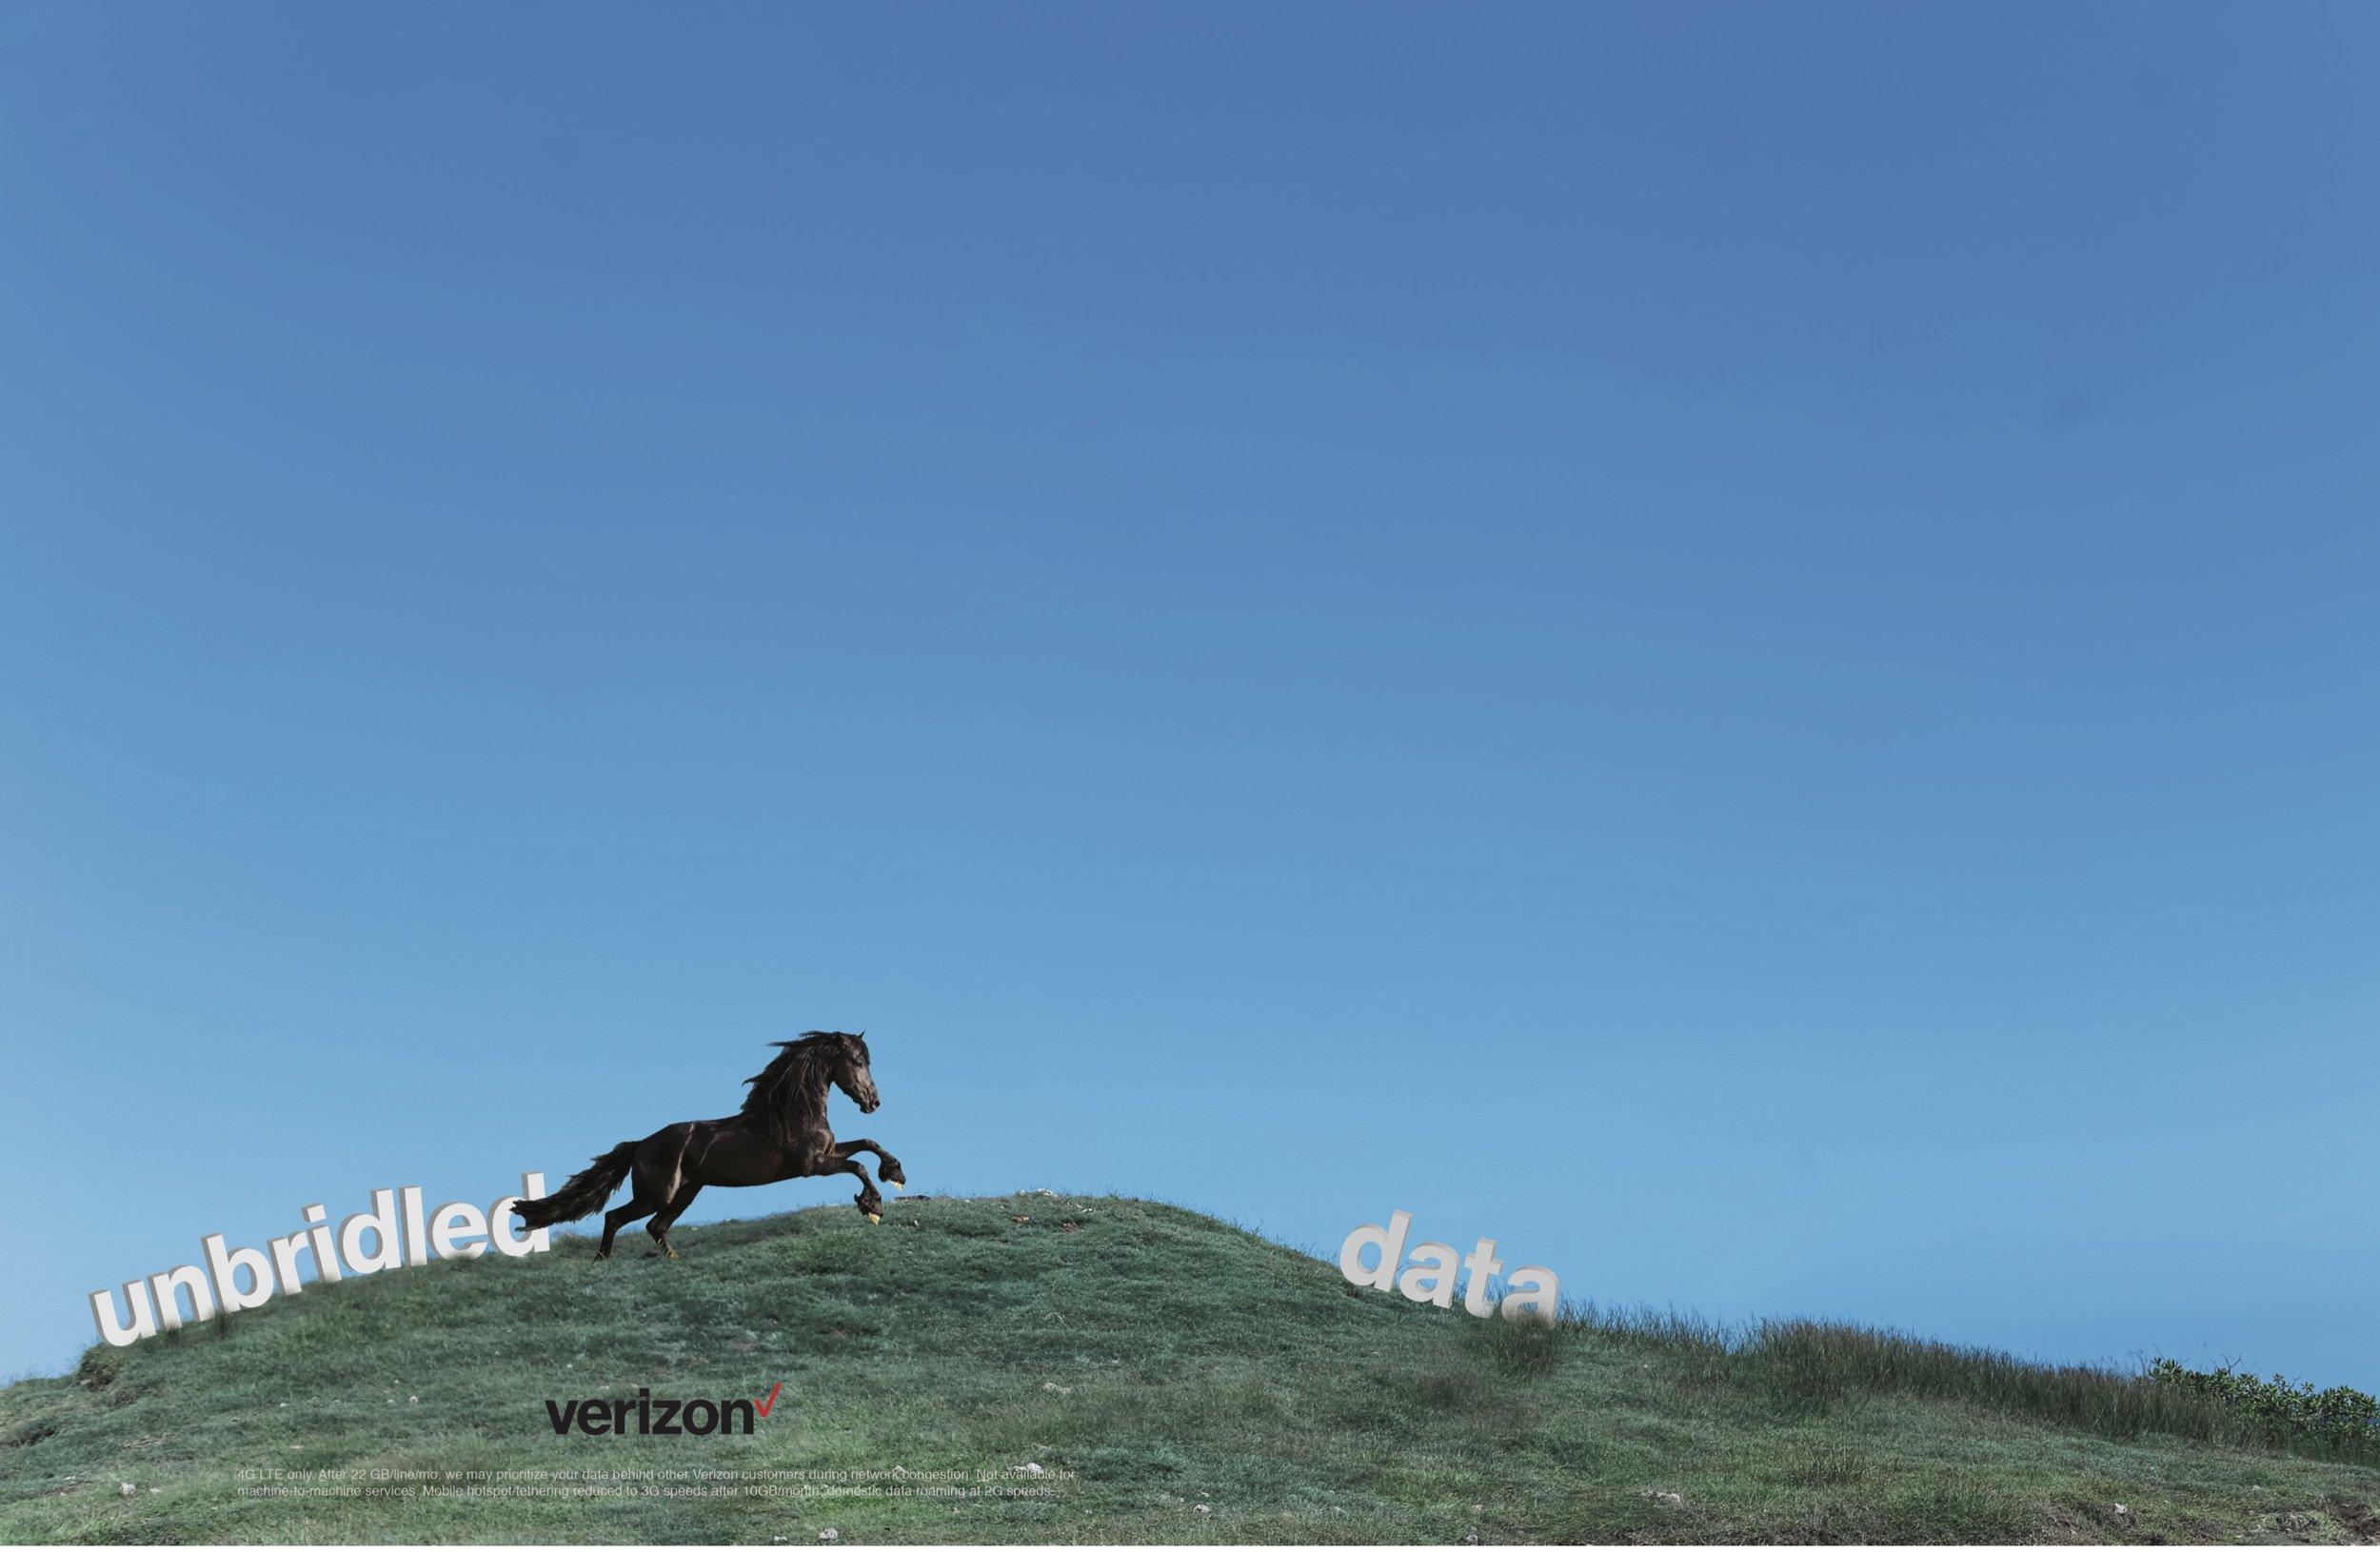 Verizon2.jpg